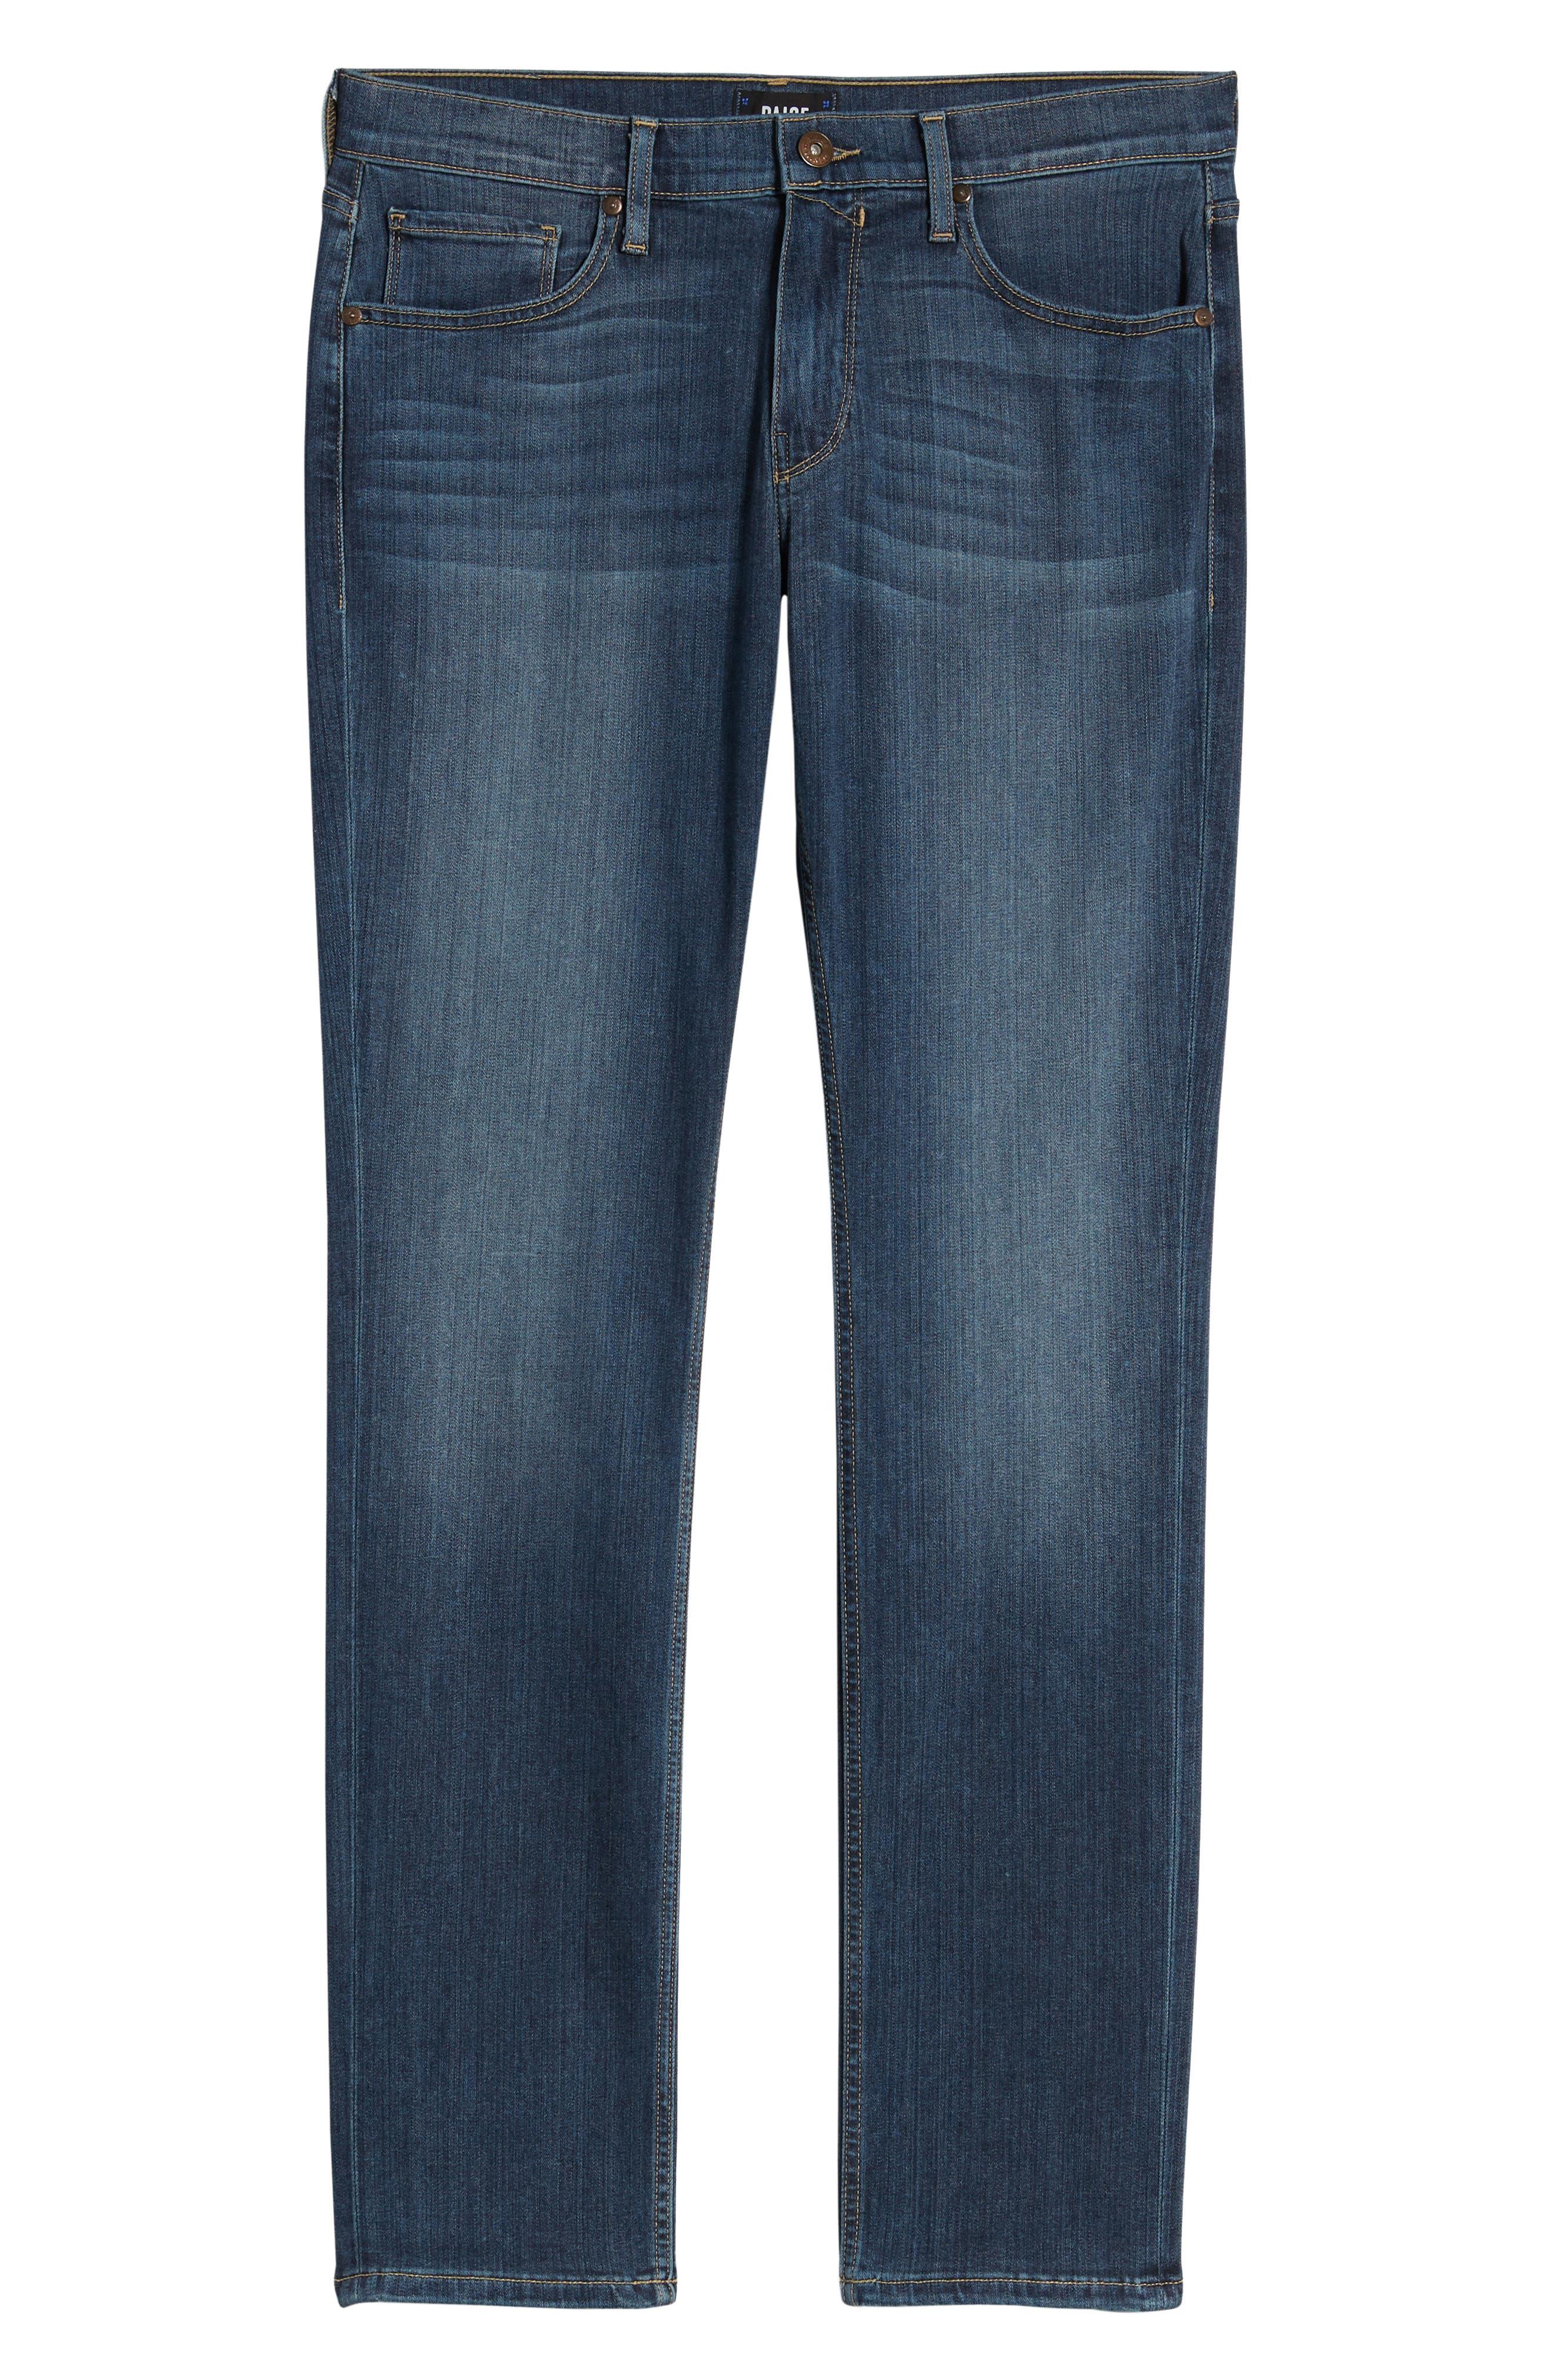 PAIGE, Transcend - Federal Slim Straight Leg Jeans, Alternate thumbnail 8, color, BIRCH